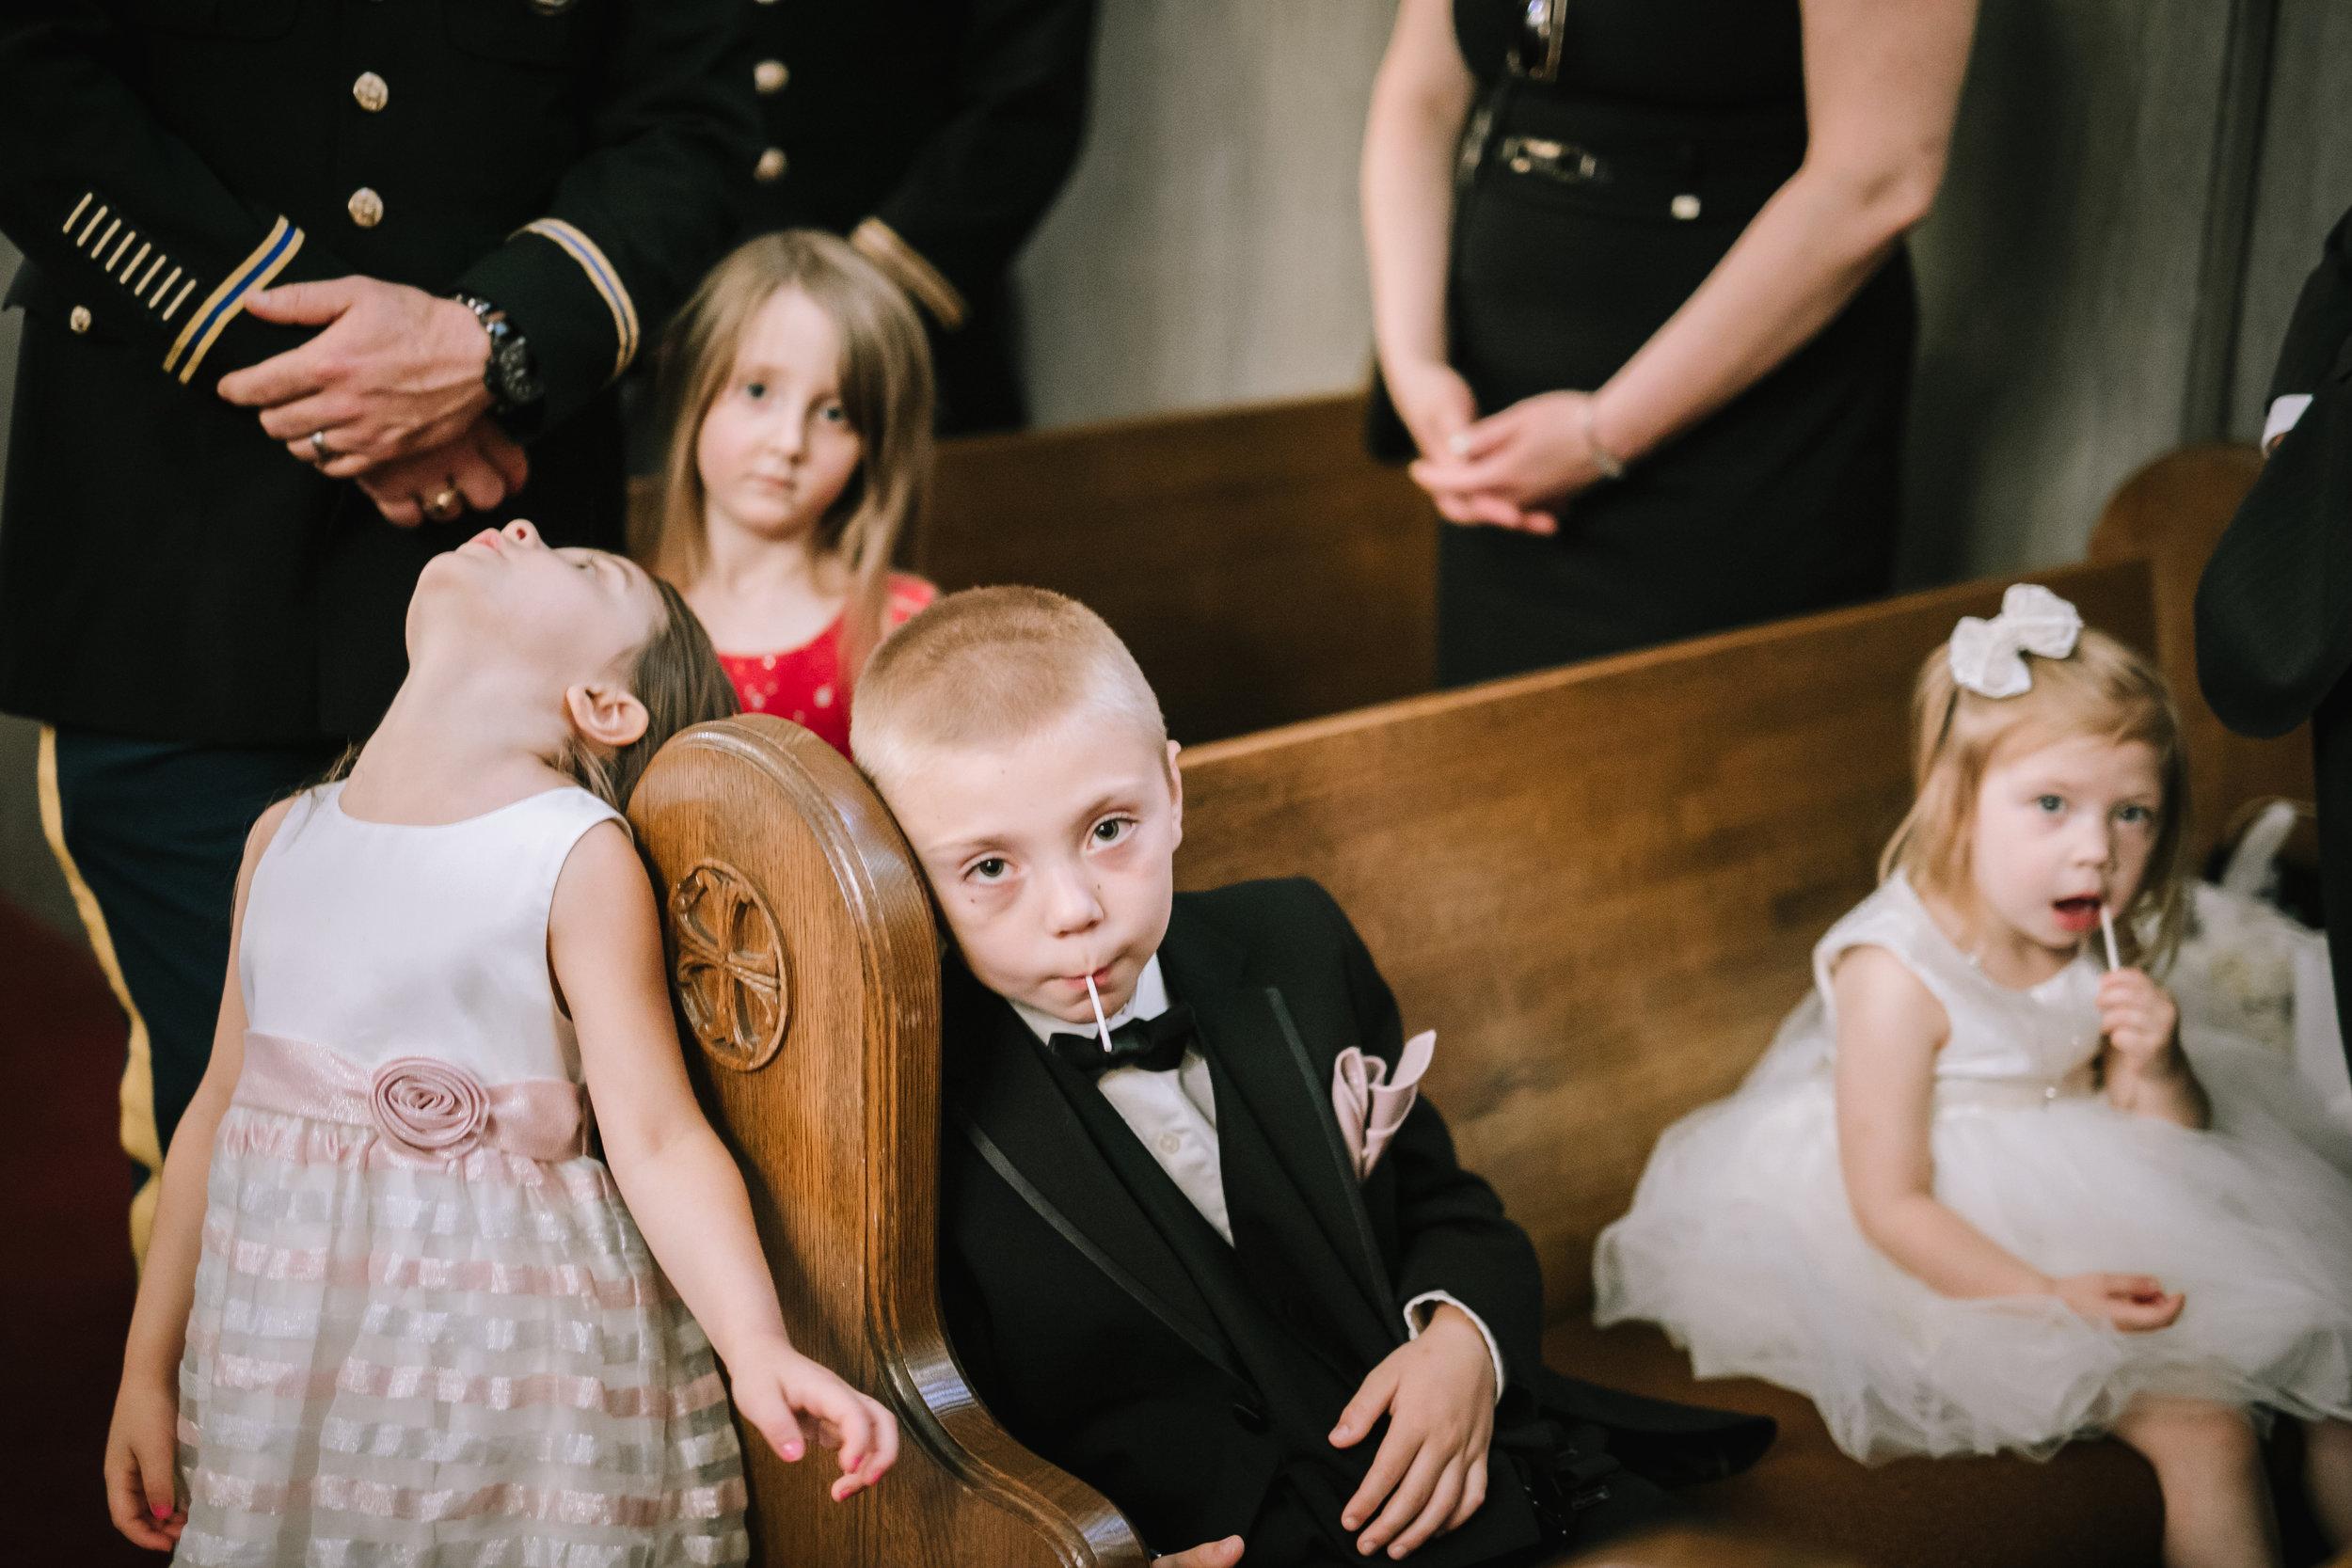 funny-bored-kids-at-wedding.jpg